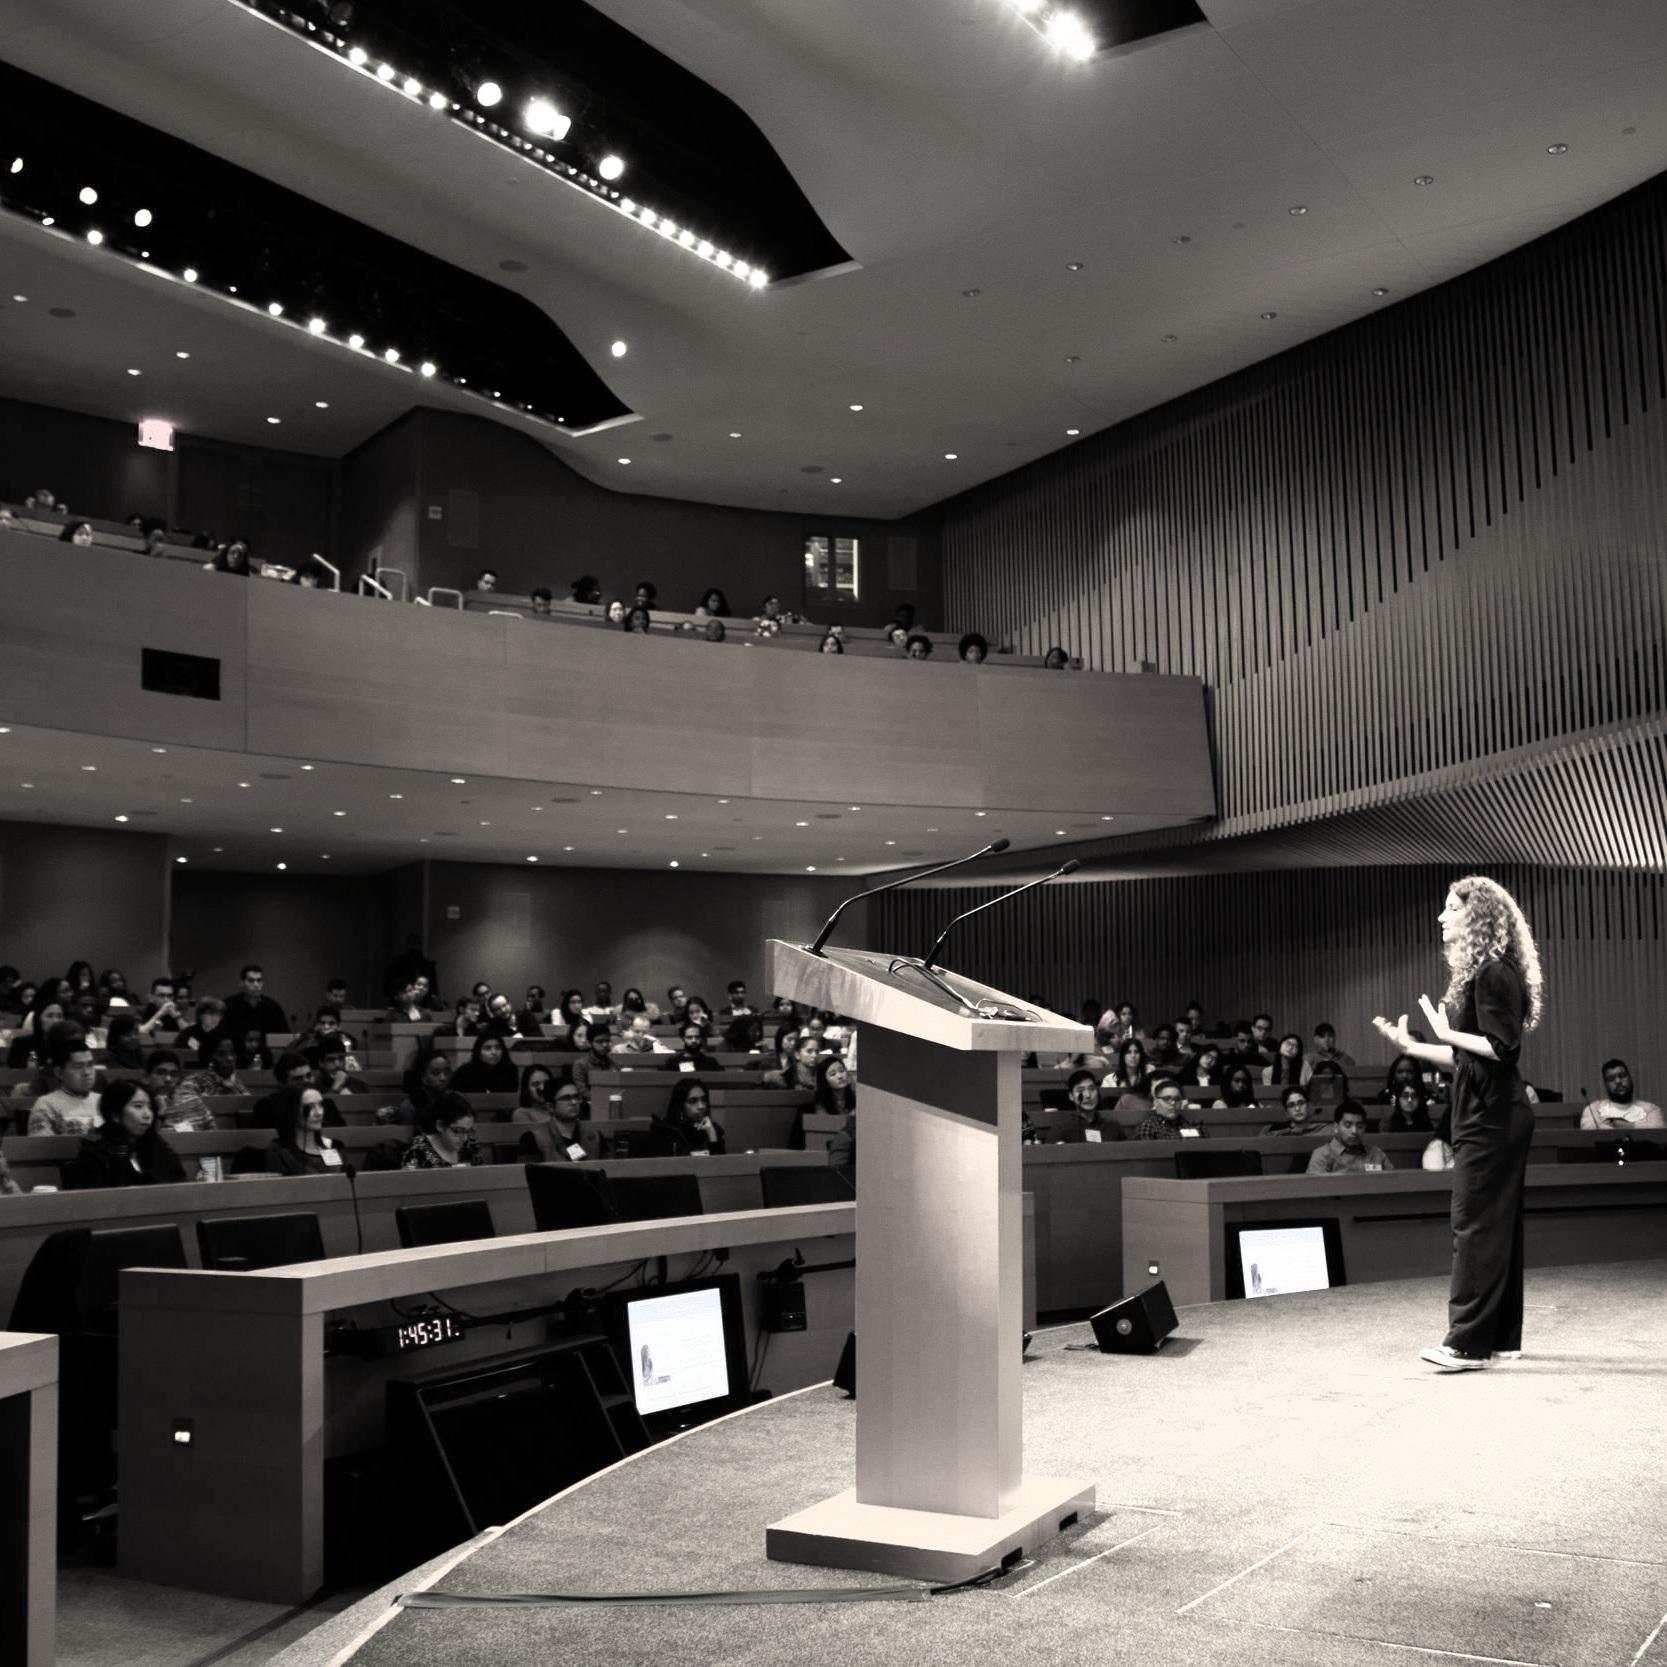 Lisa Rachel Snyder, Public Speaking  - Photo by Jackson You